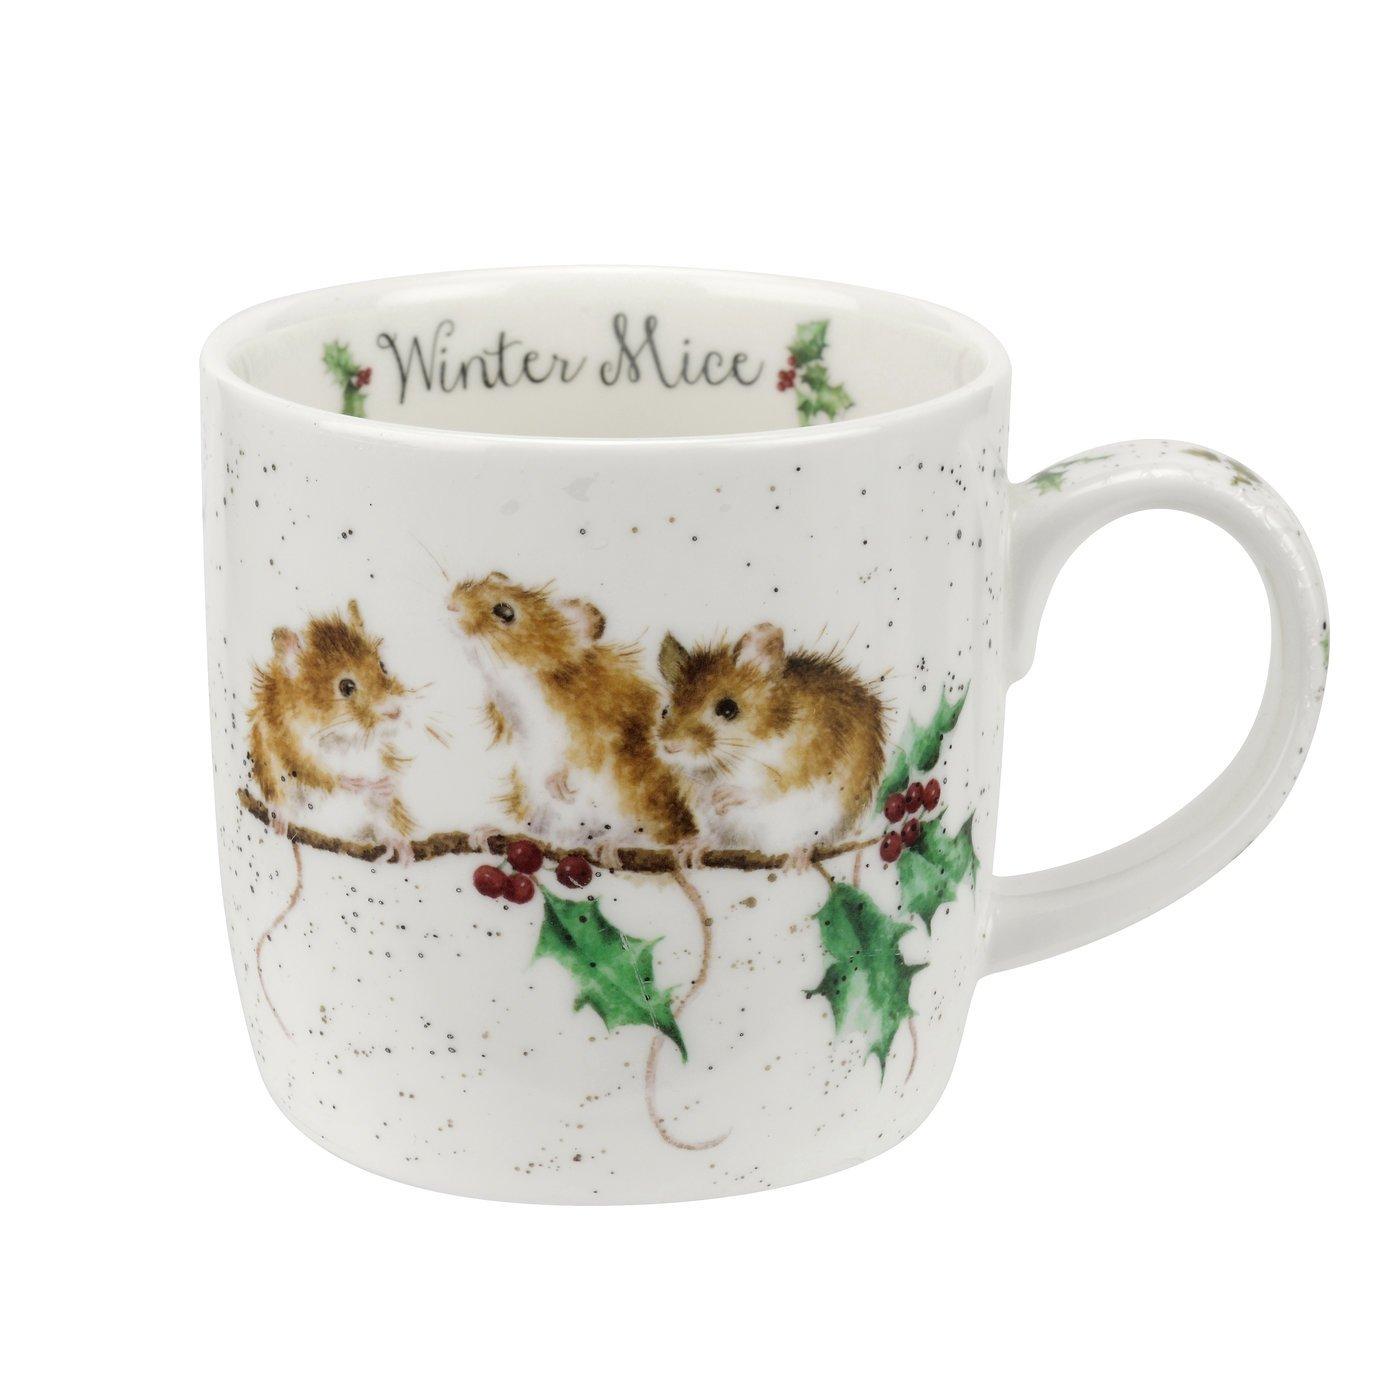 Bone China Single Mug Mice Multi Coloured 12 x 8.4 x 8 cm Wrendale Winter